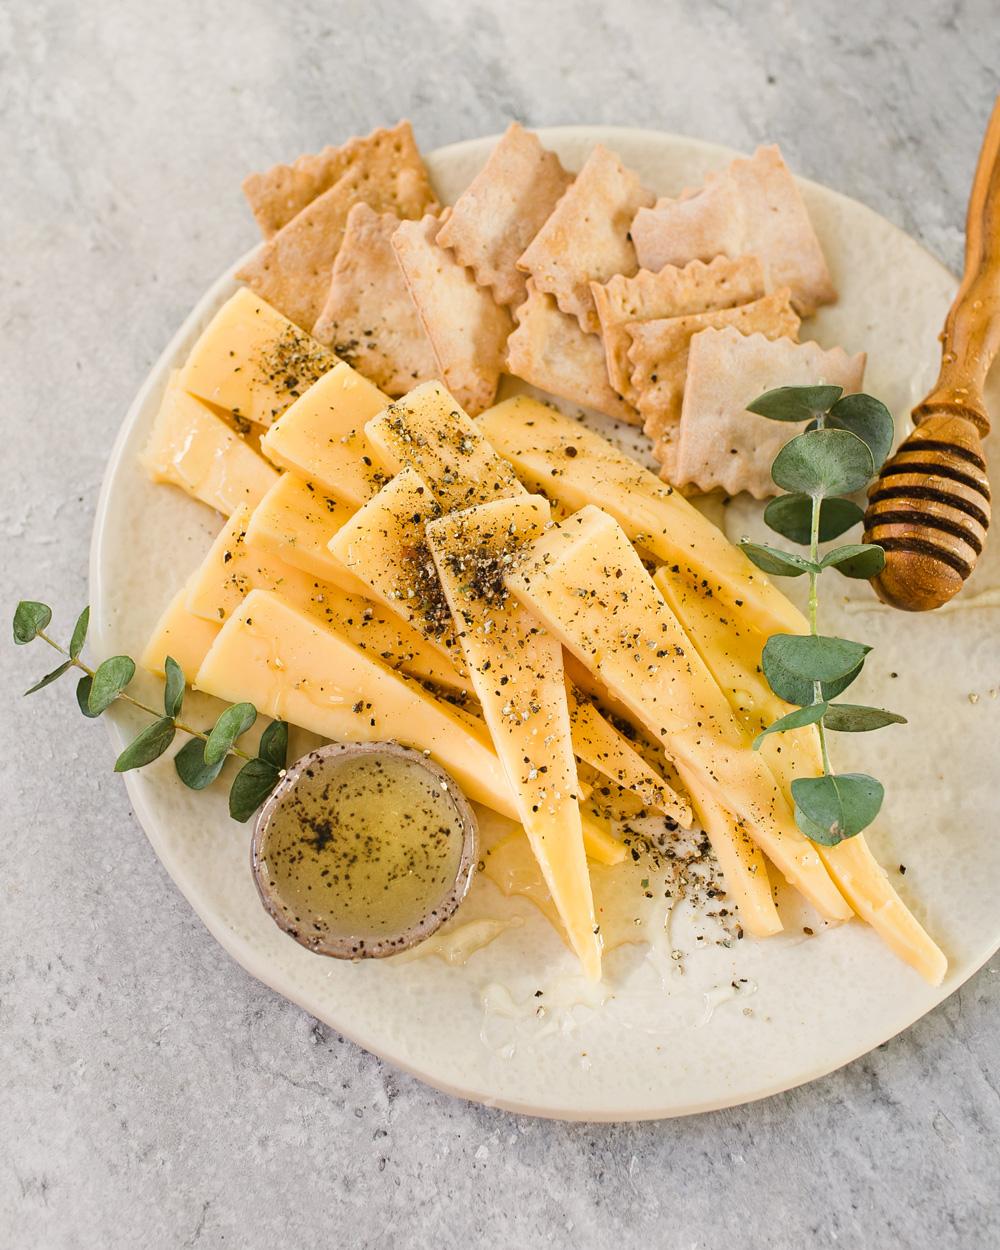 Gouda & Honey Cheese Plate